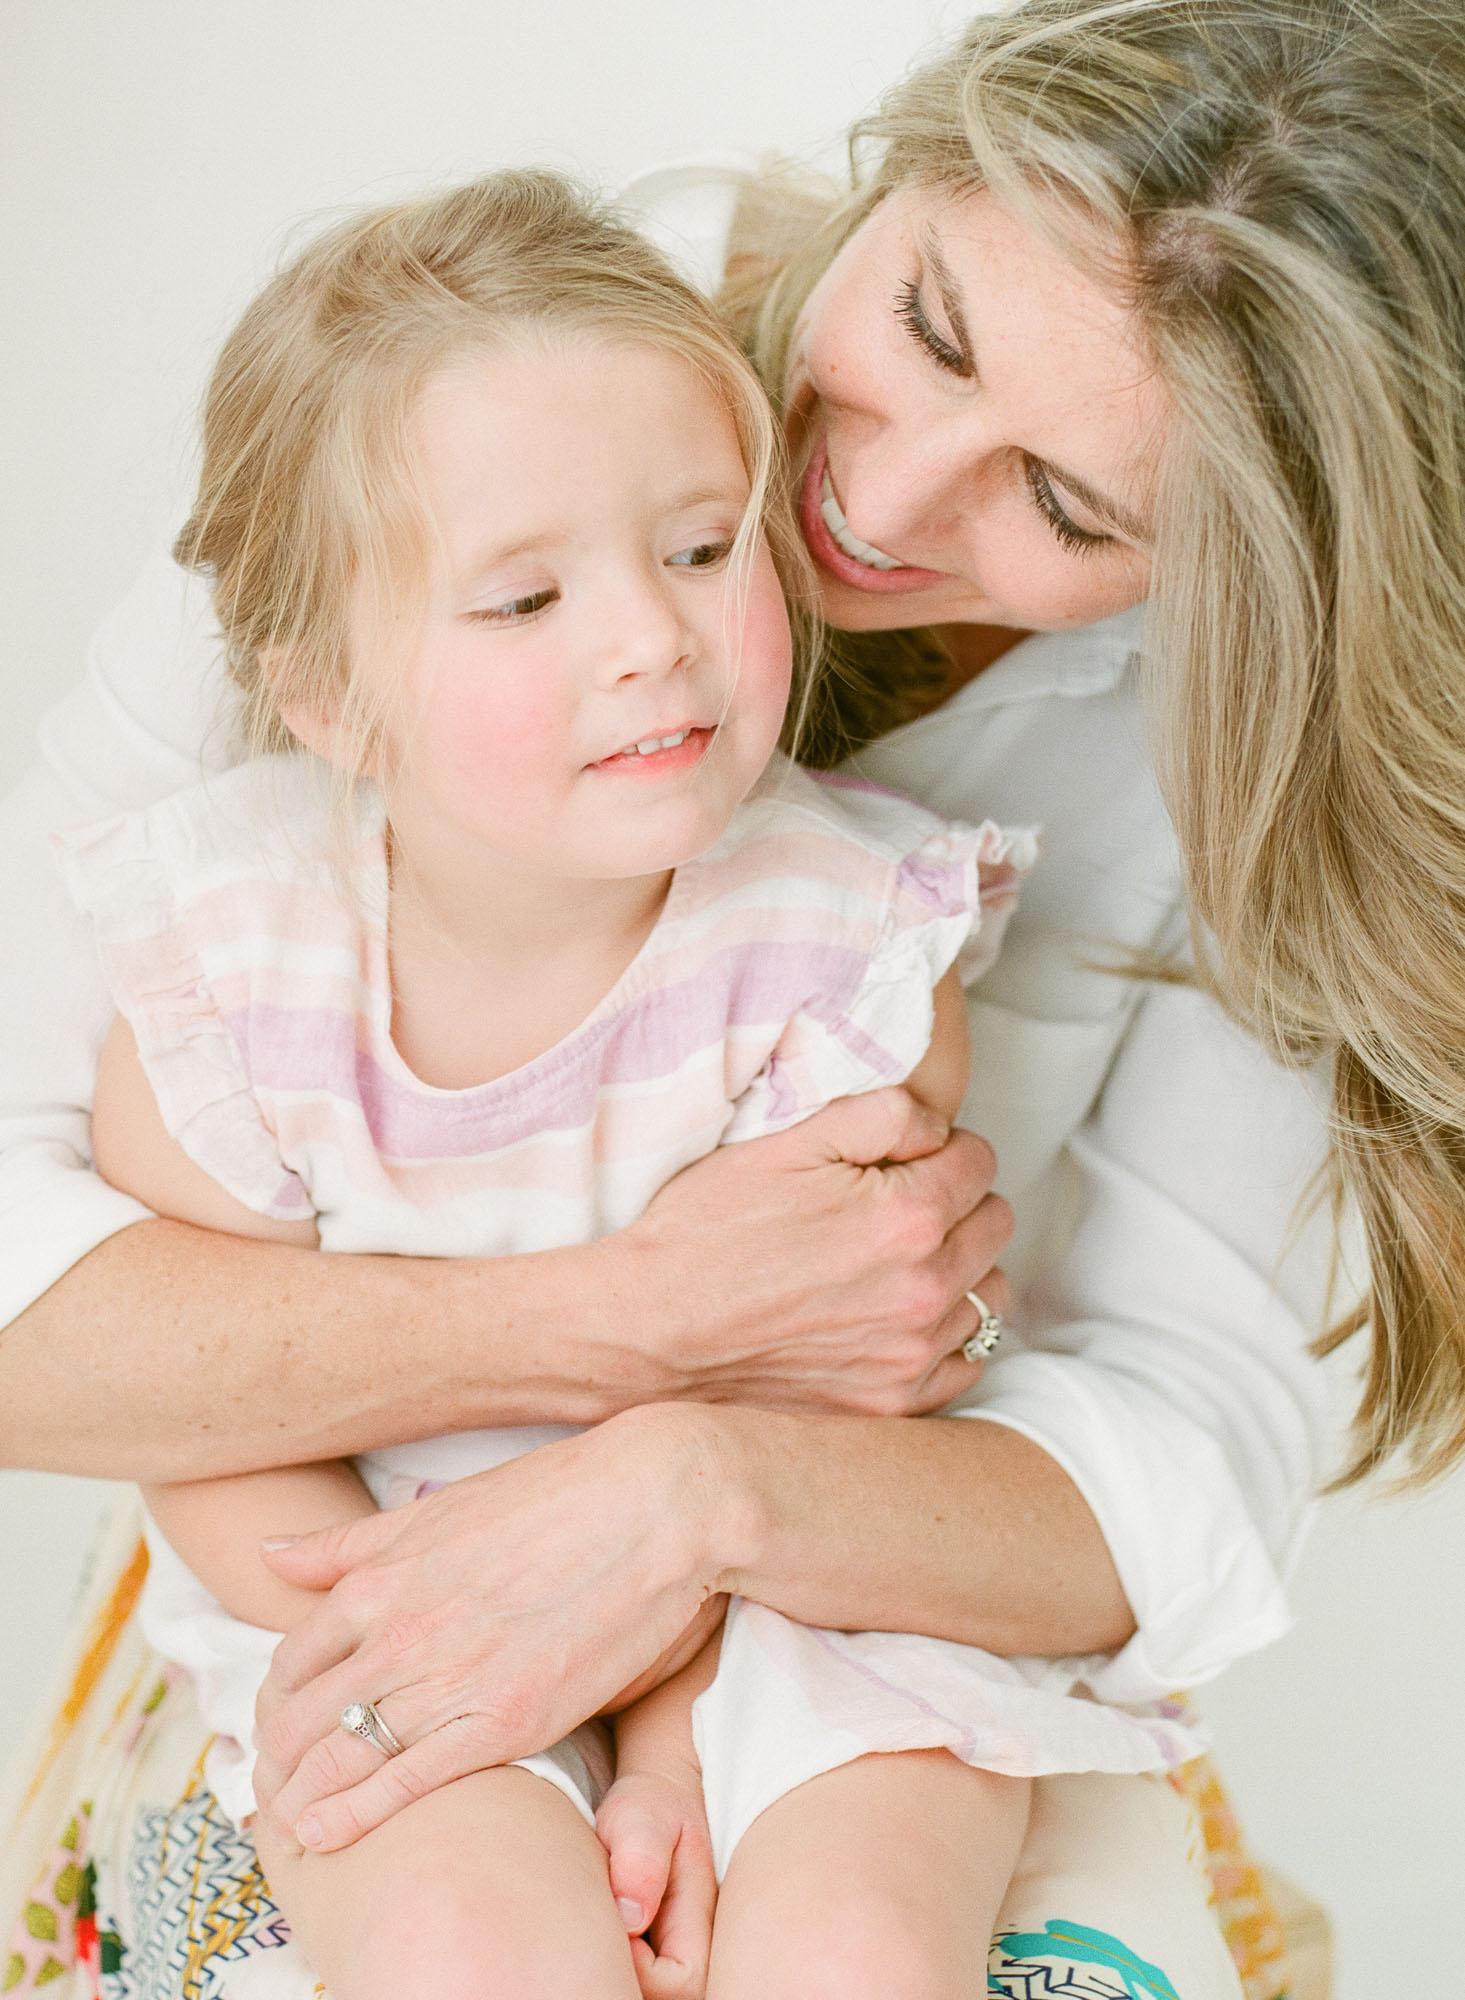 family-photographer-wake-forest-nc-motherhood-studio-portraits-005